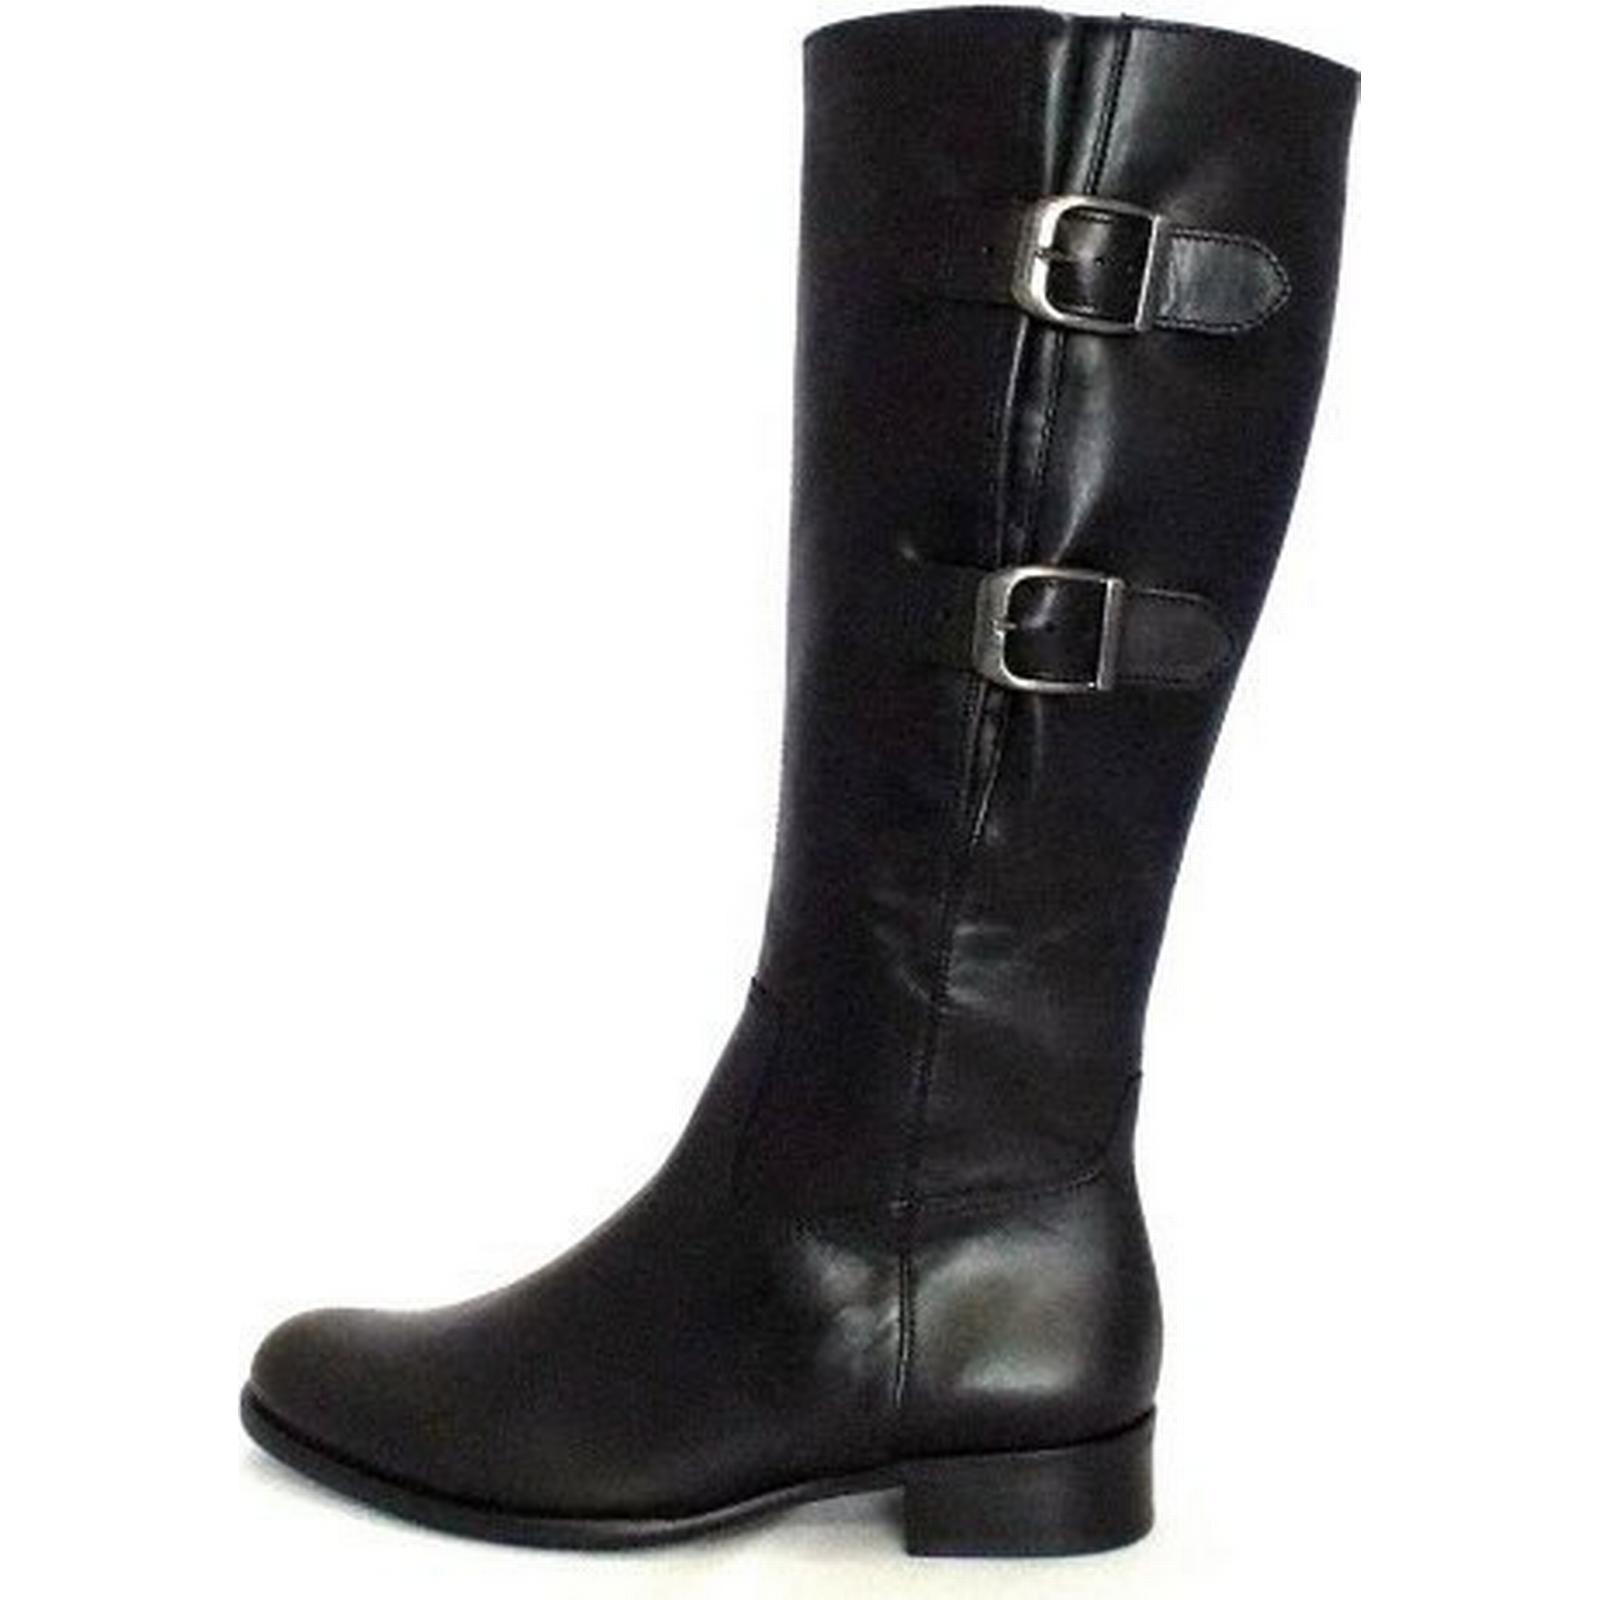 Gabor Astoria Ladies Knee High Boot In Black Size: Size: Black 2.5, Colour: BLACK 69906d